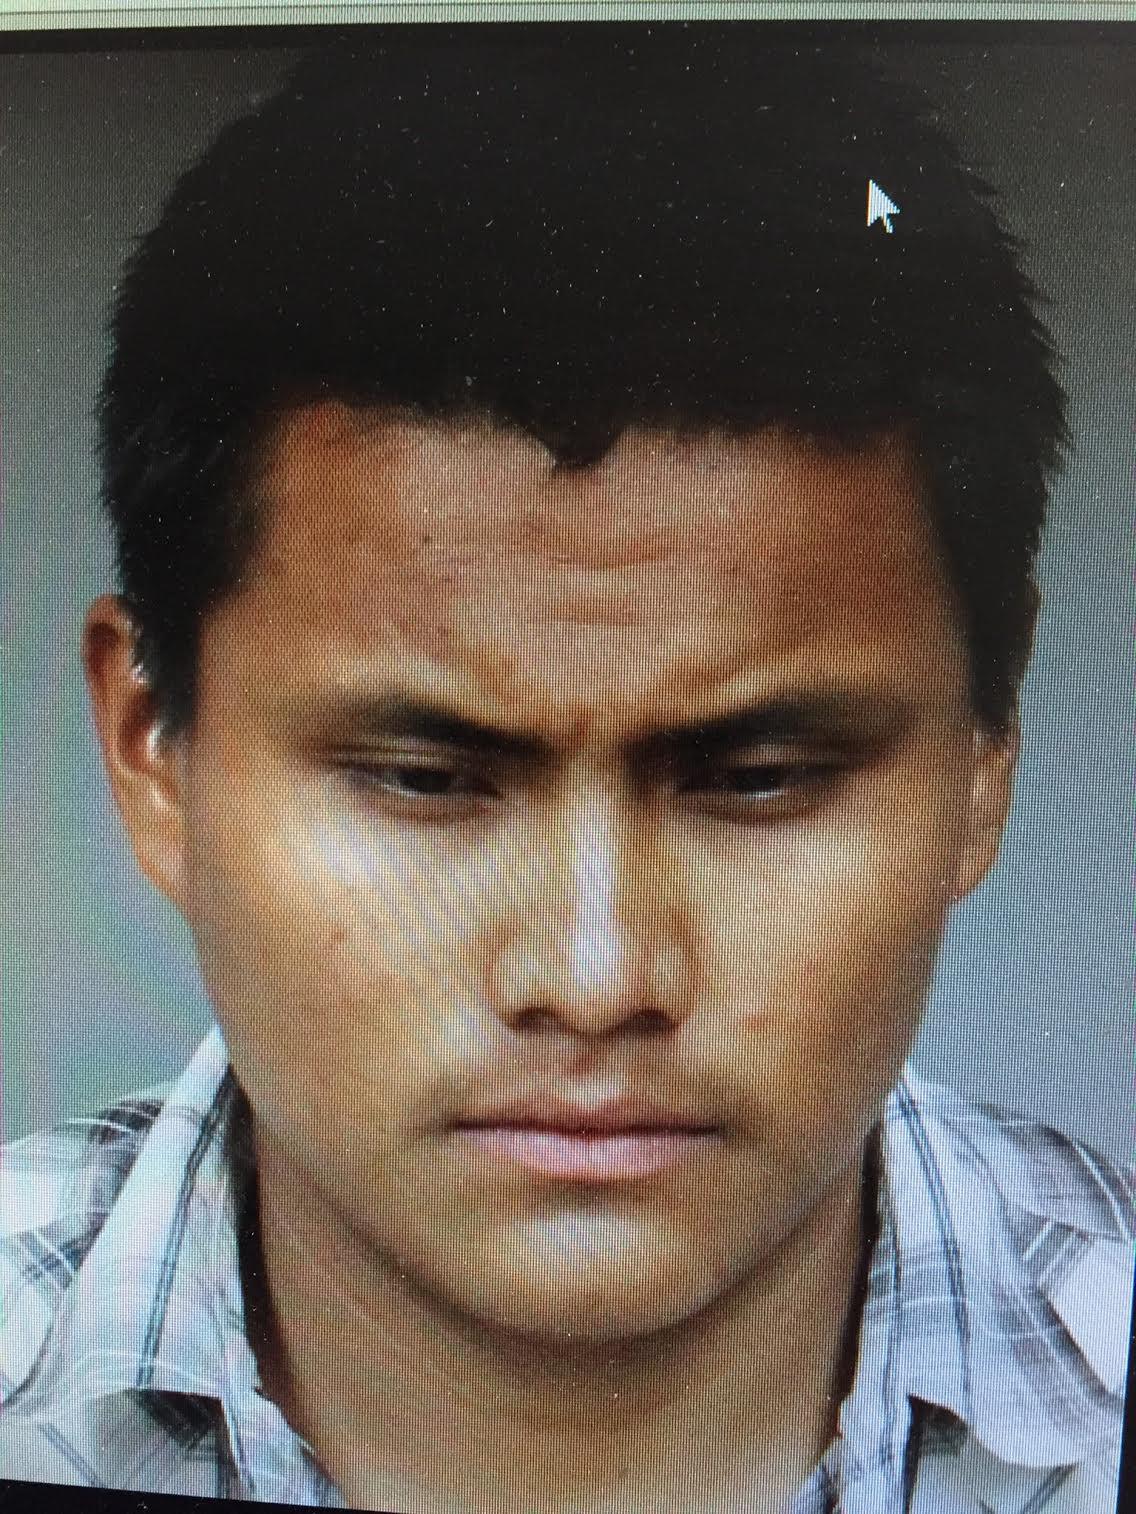 Man injured in Paso Robles stabbing